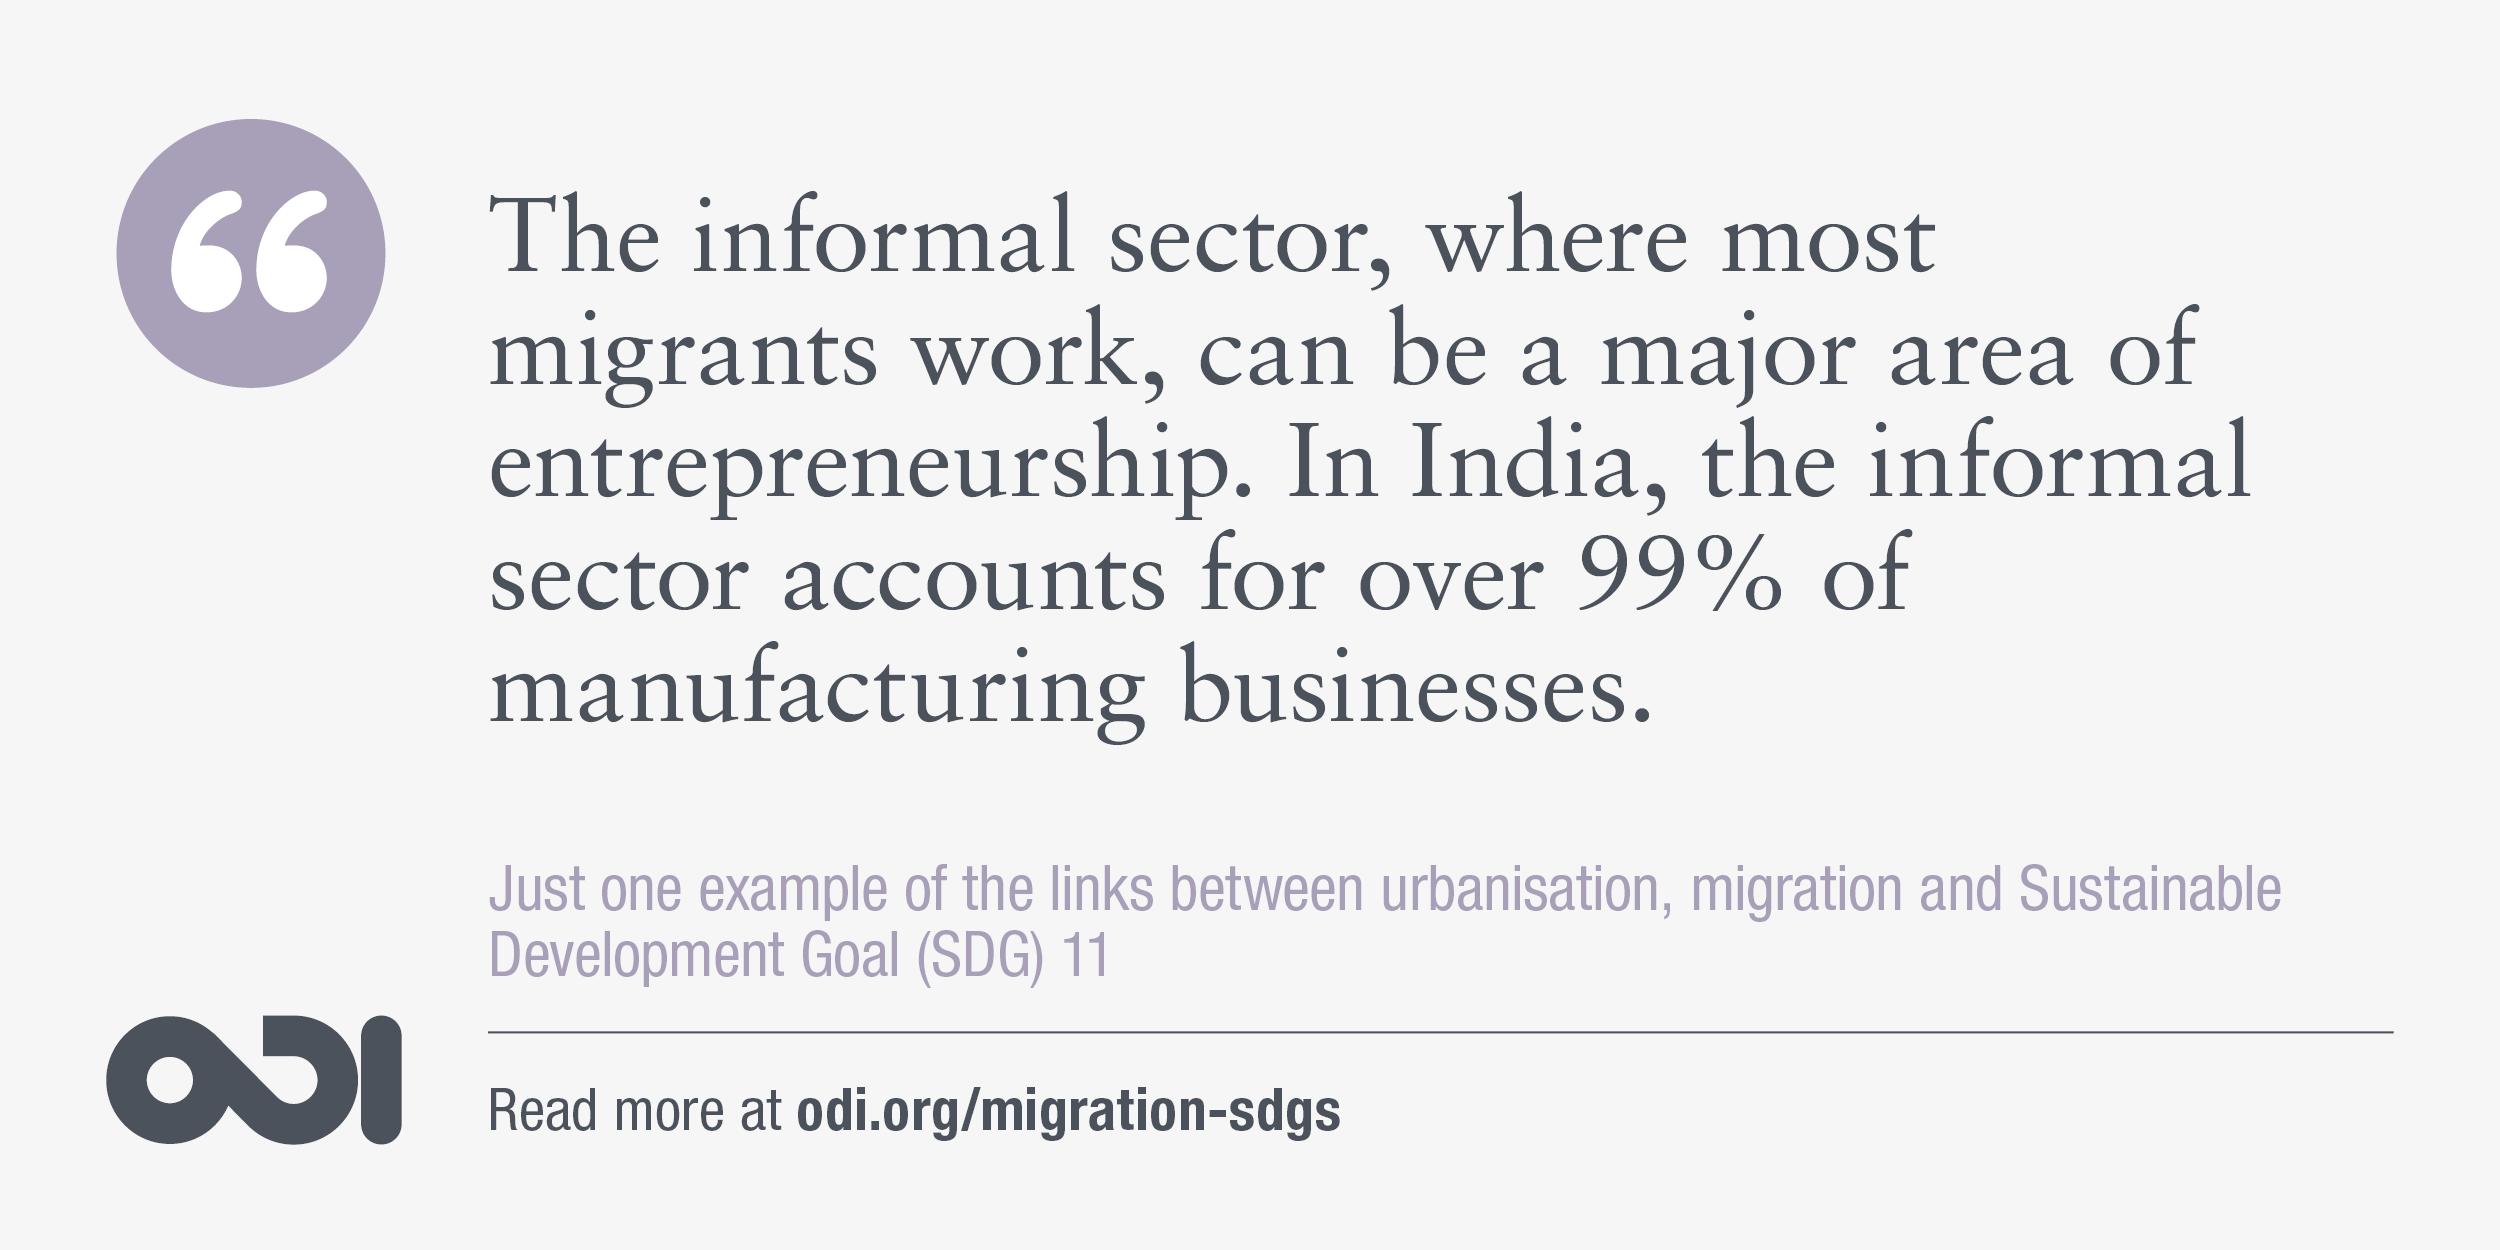 The links between urbanisation, migration and SDG 11.